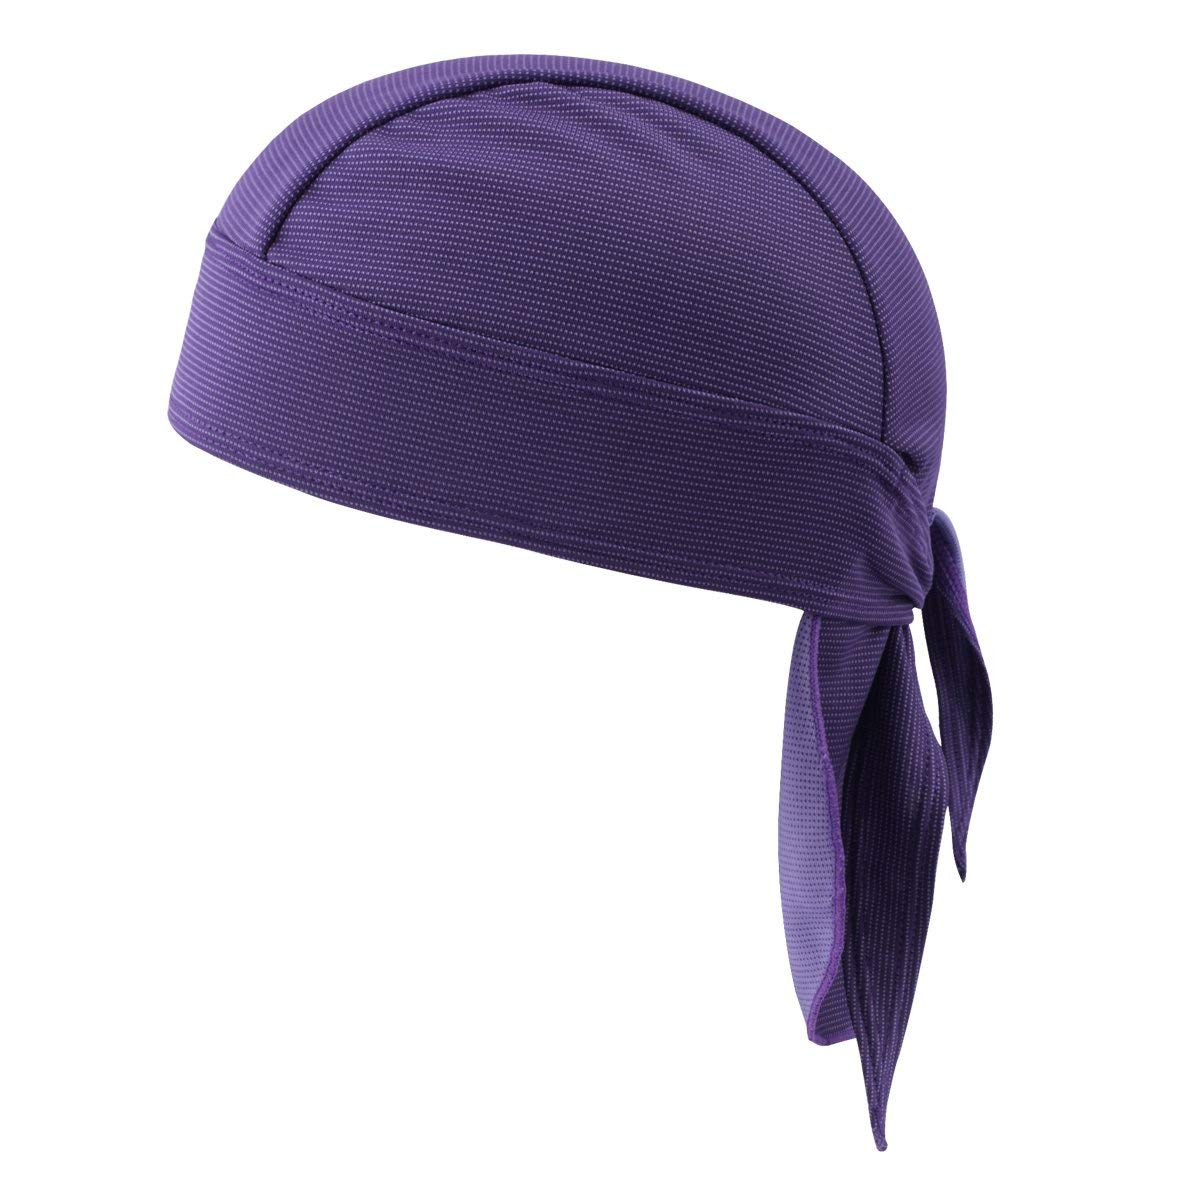 564d186385 Get Quotations · Tofern Men and Women Helmet Liner Skull Cap Cycling  Running Sport Bandana Hat Headscarf Sweat Absorbent